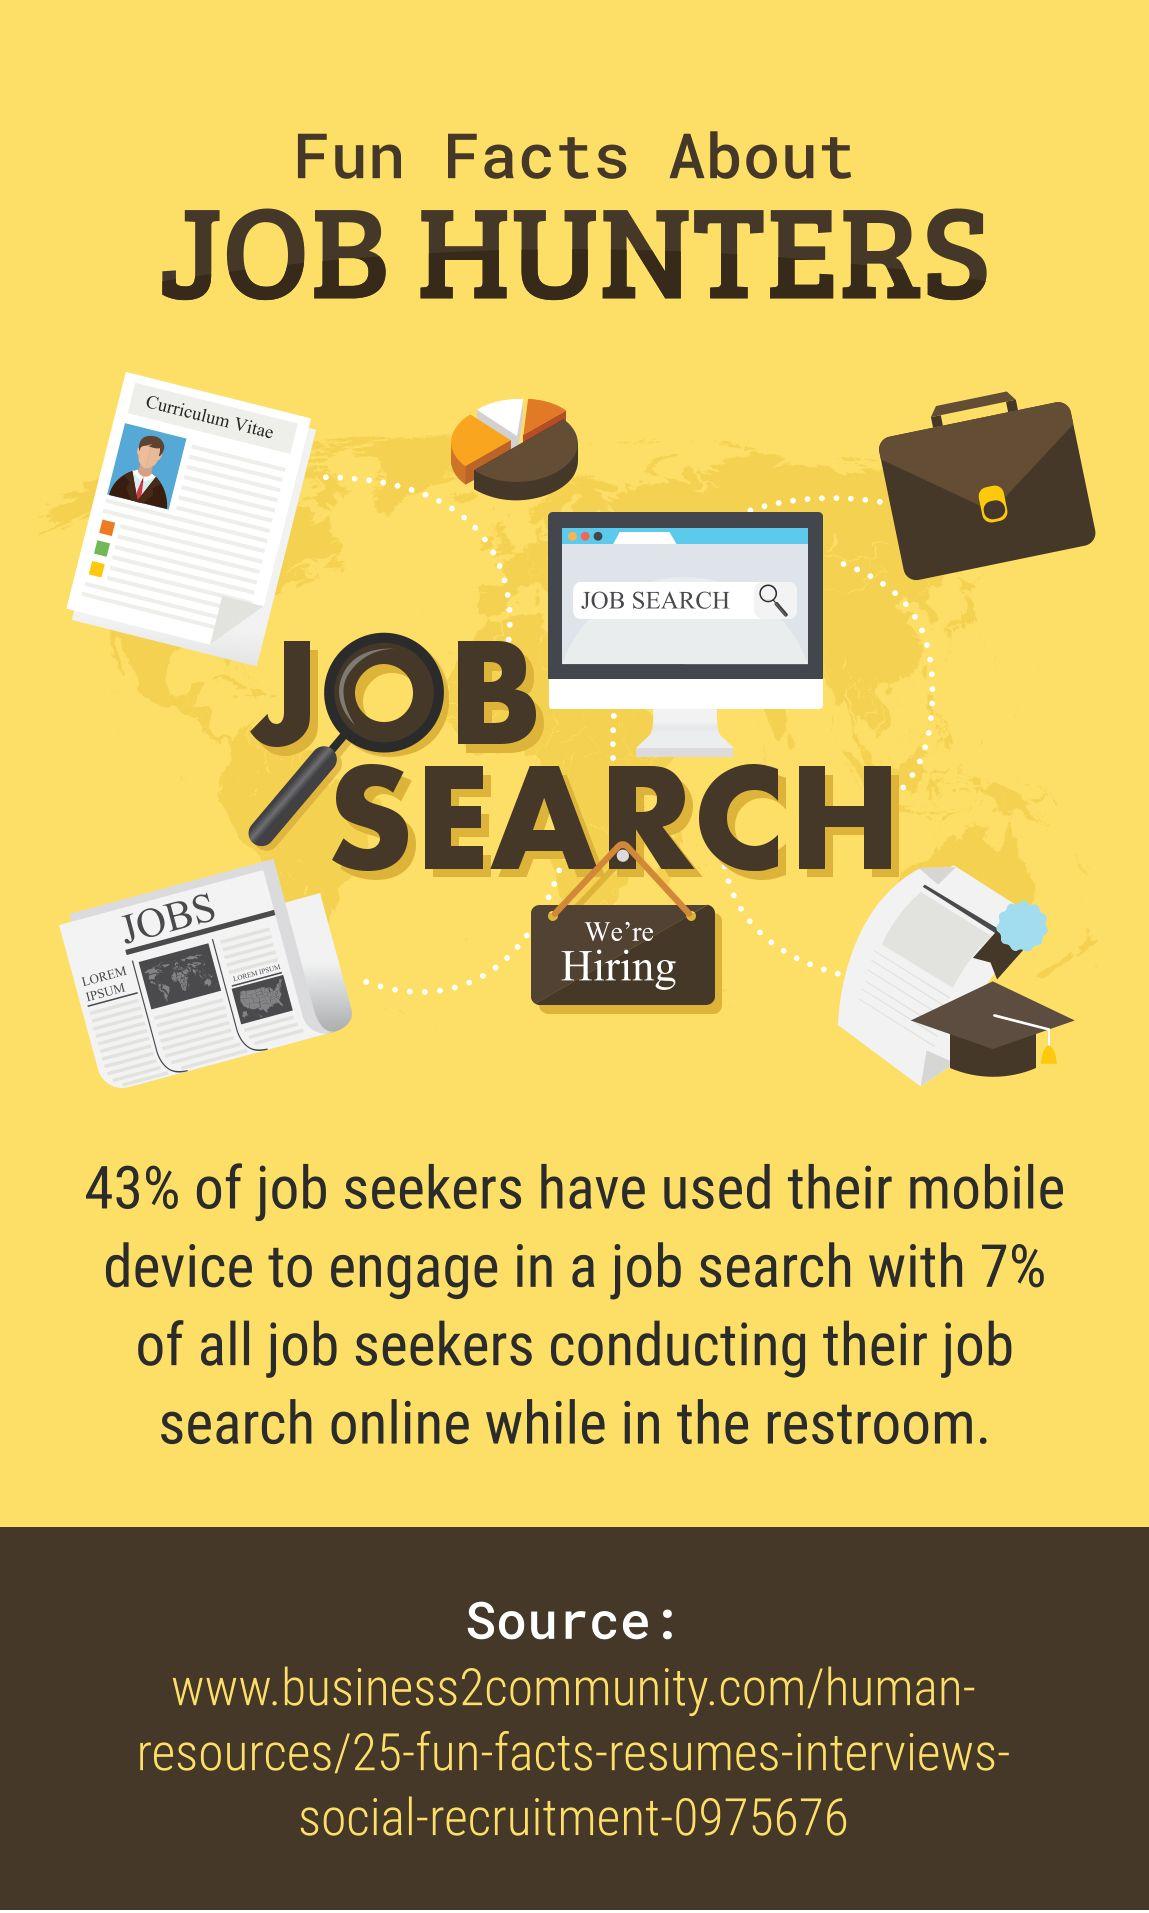 Fun facts about job hunters funfacts jobhunters fun